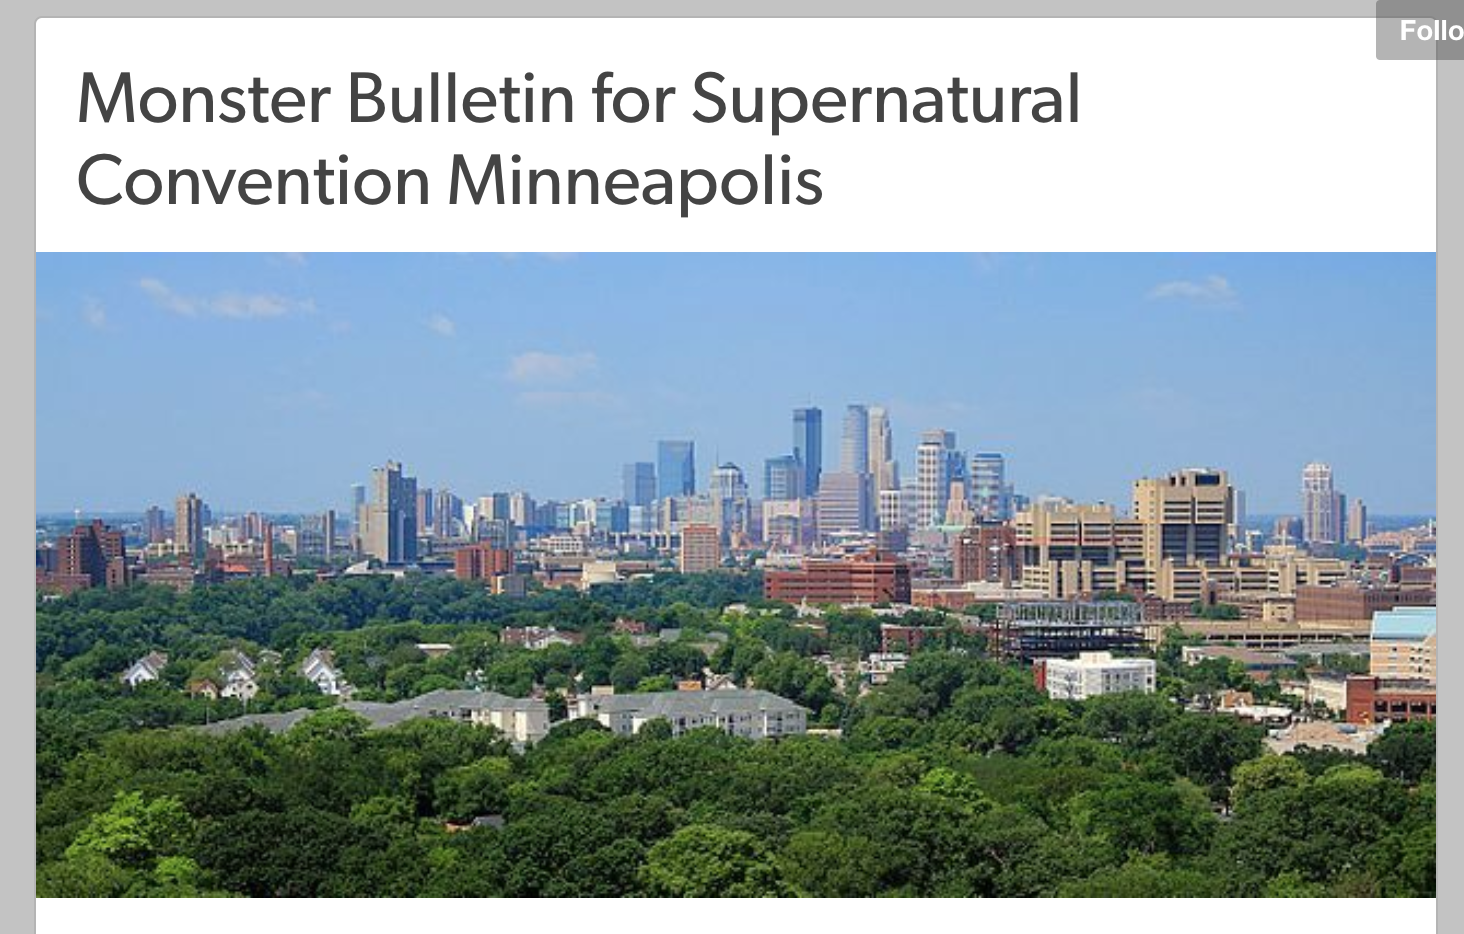 Supernatural Monster Bulletin: Minneapolis